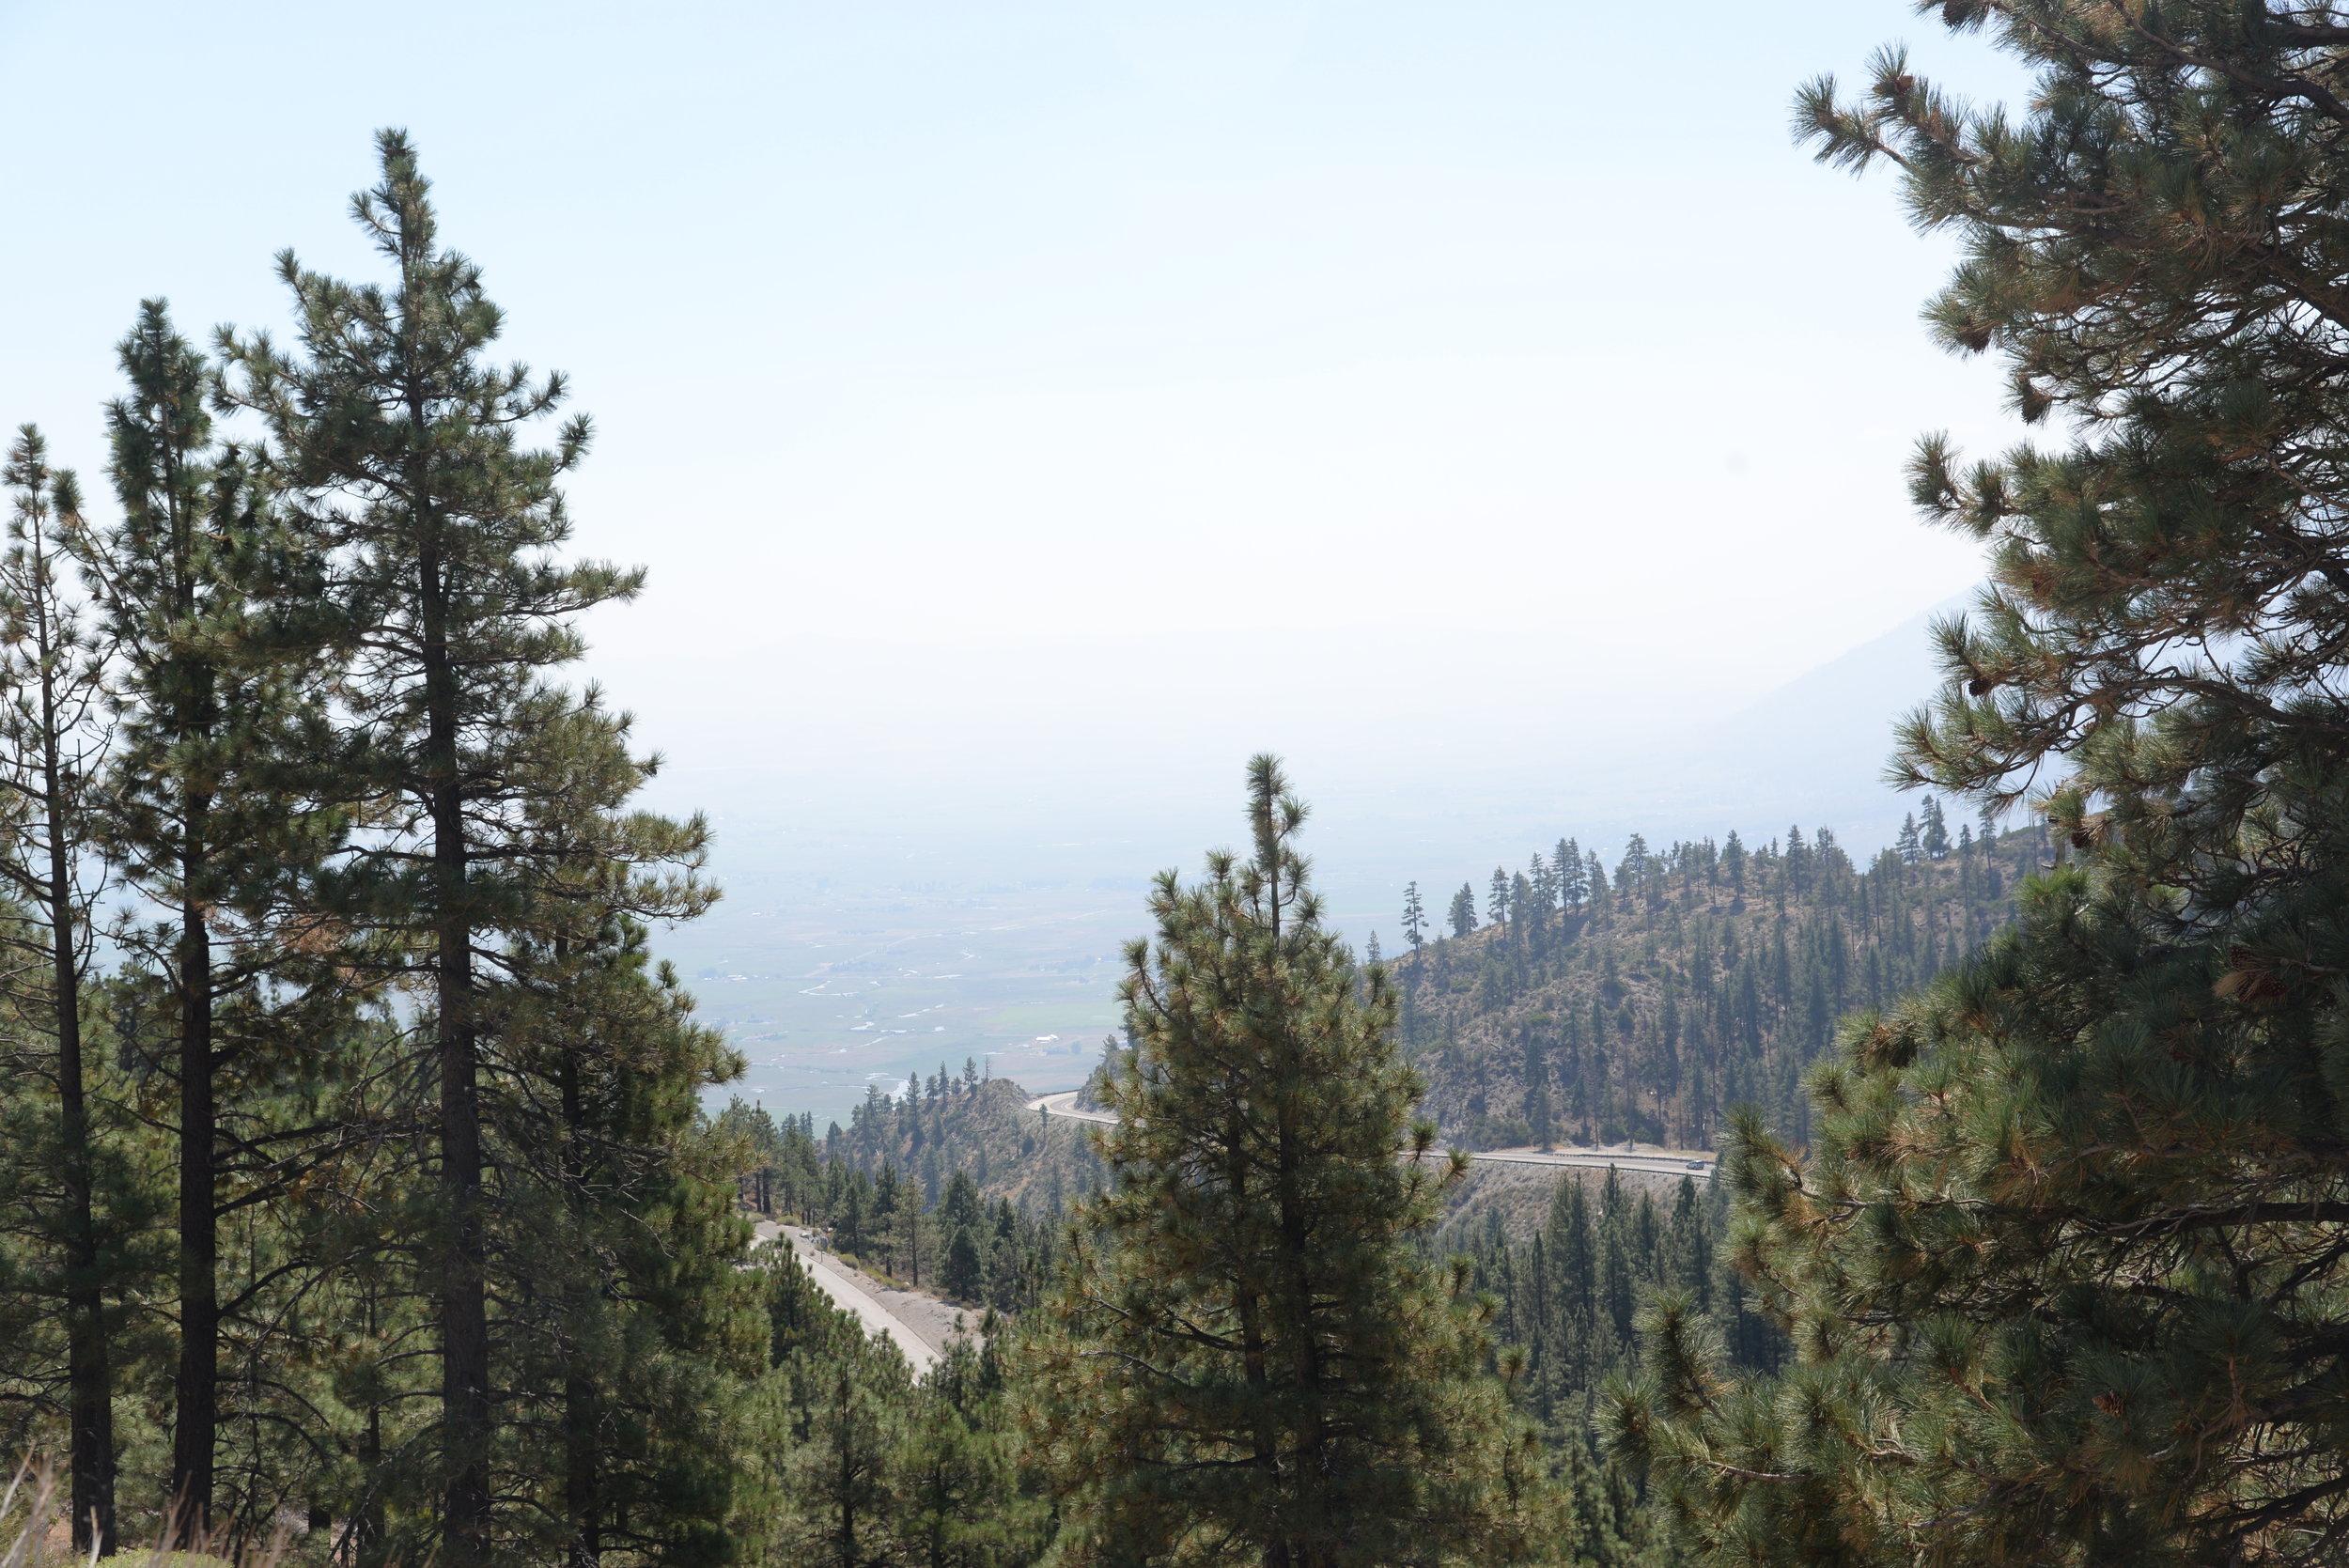 Heading towards Yosemite National Park.